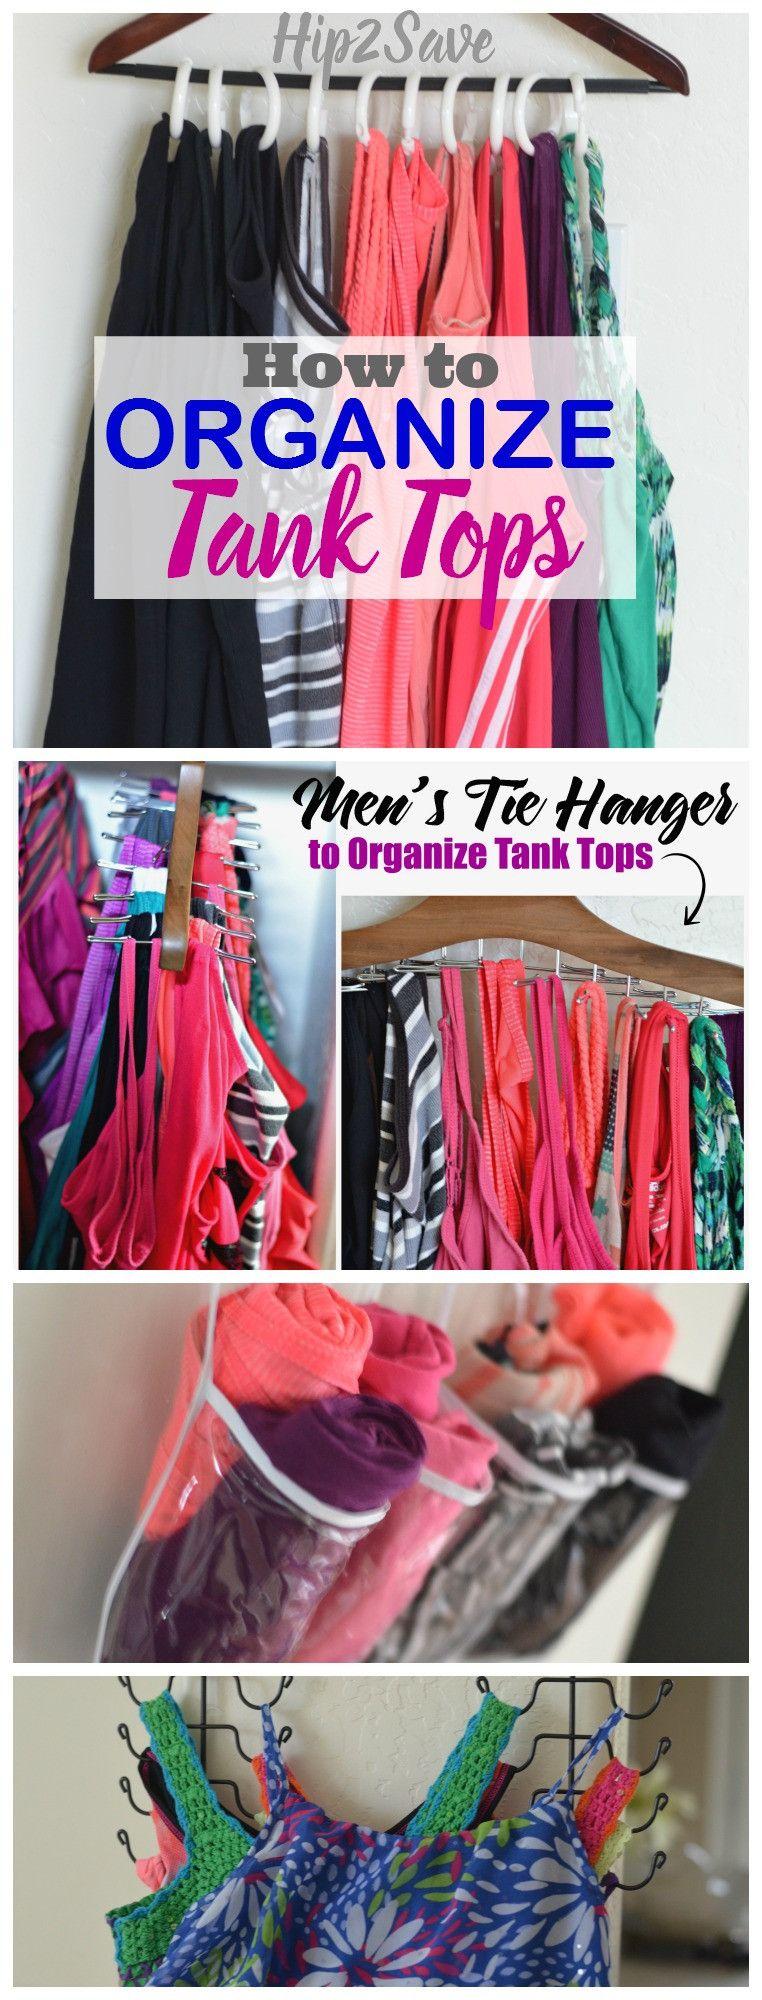 12 DIY Clothes Storage how to organize ideas